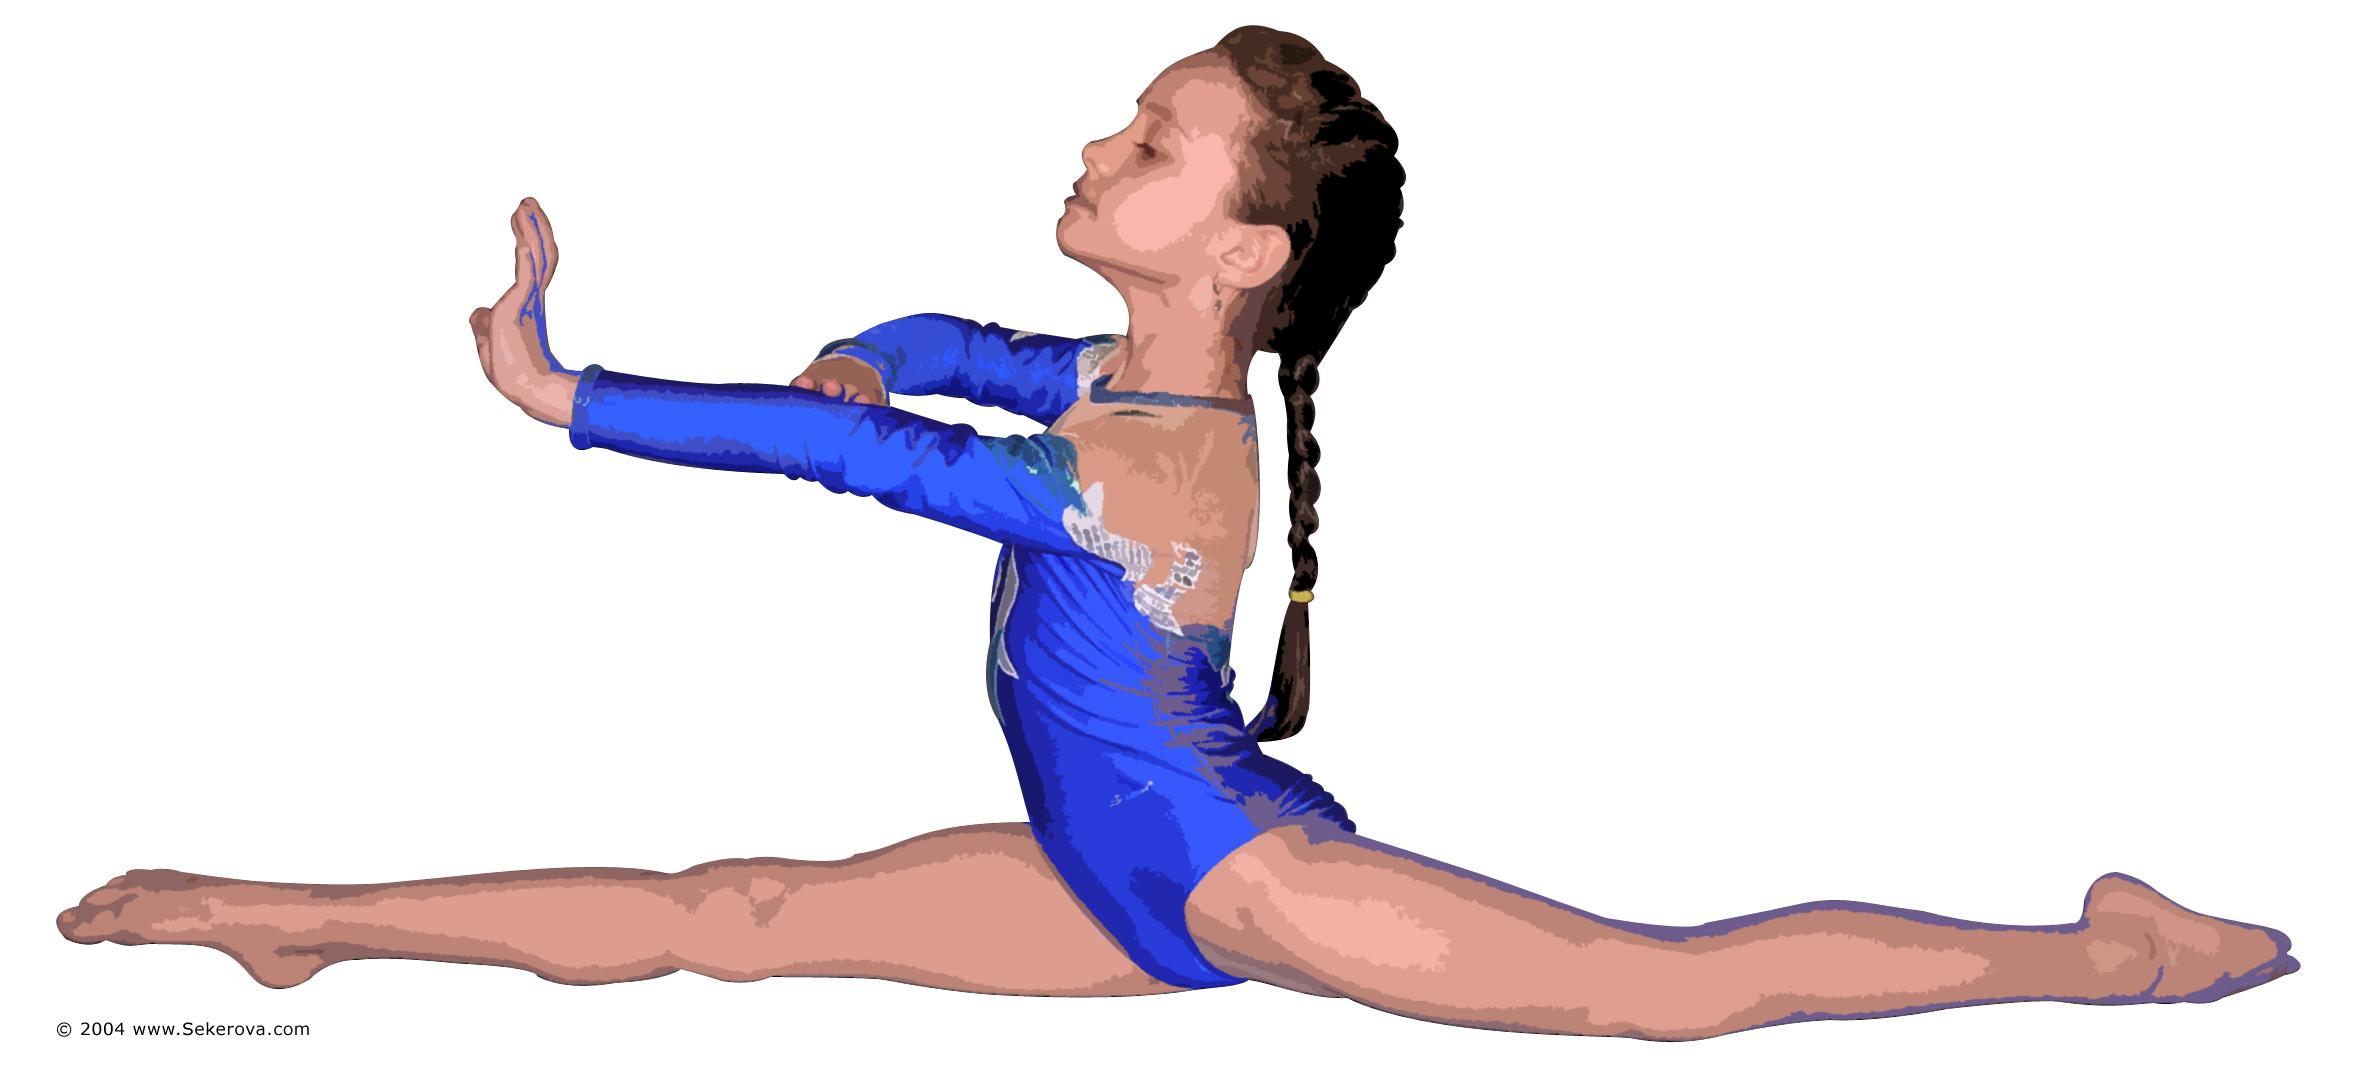 Gymnastics Clip Art 2 Clipartcow-Gymnastics clip art 2 clipartcow-3